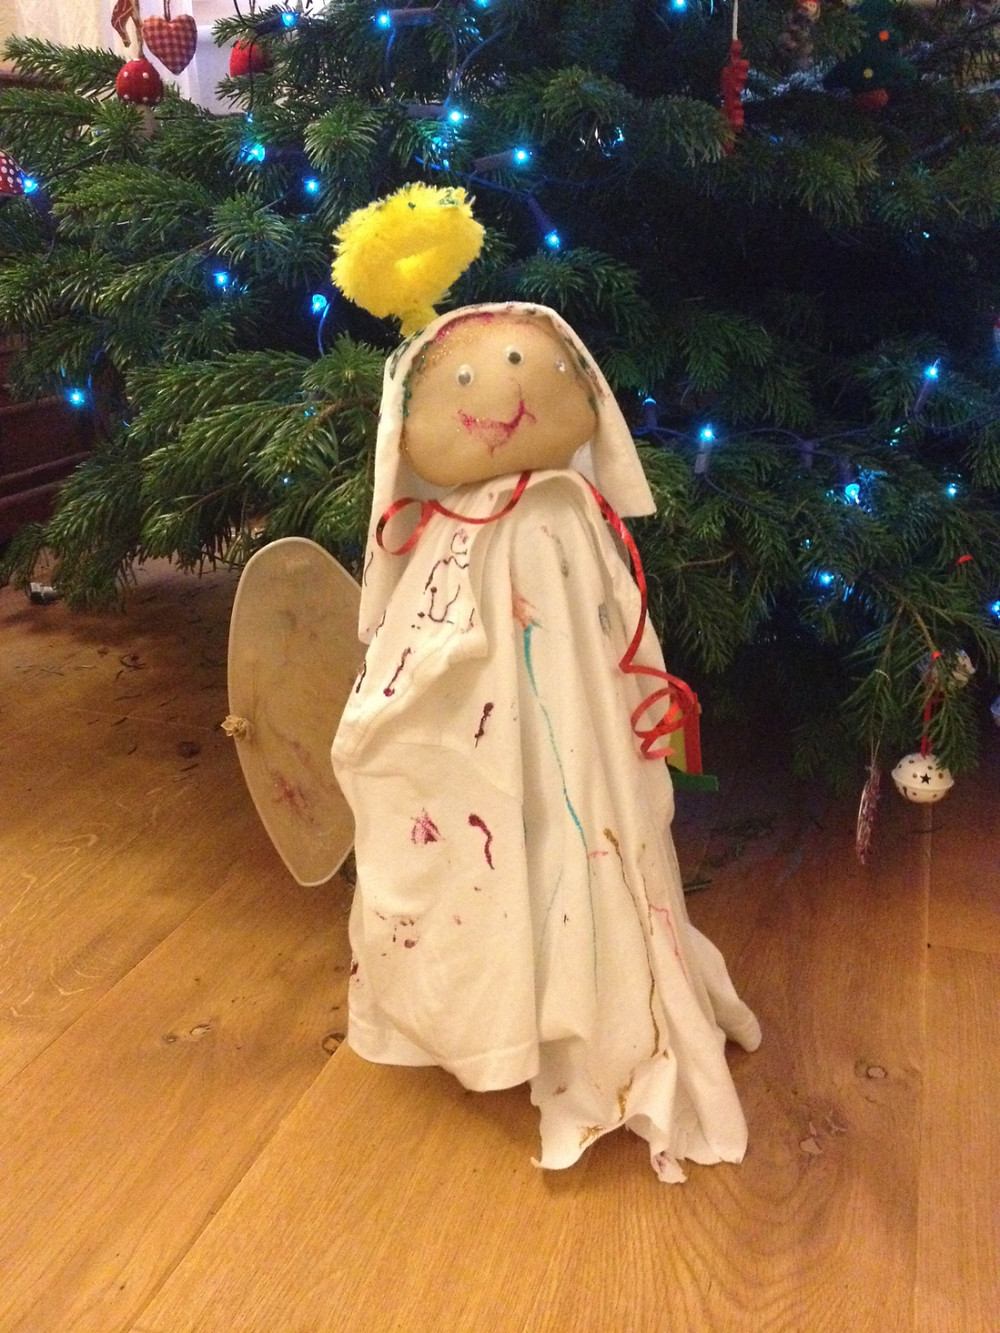 Homemade Angel under a Christmas Tree